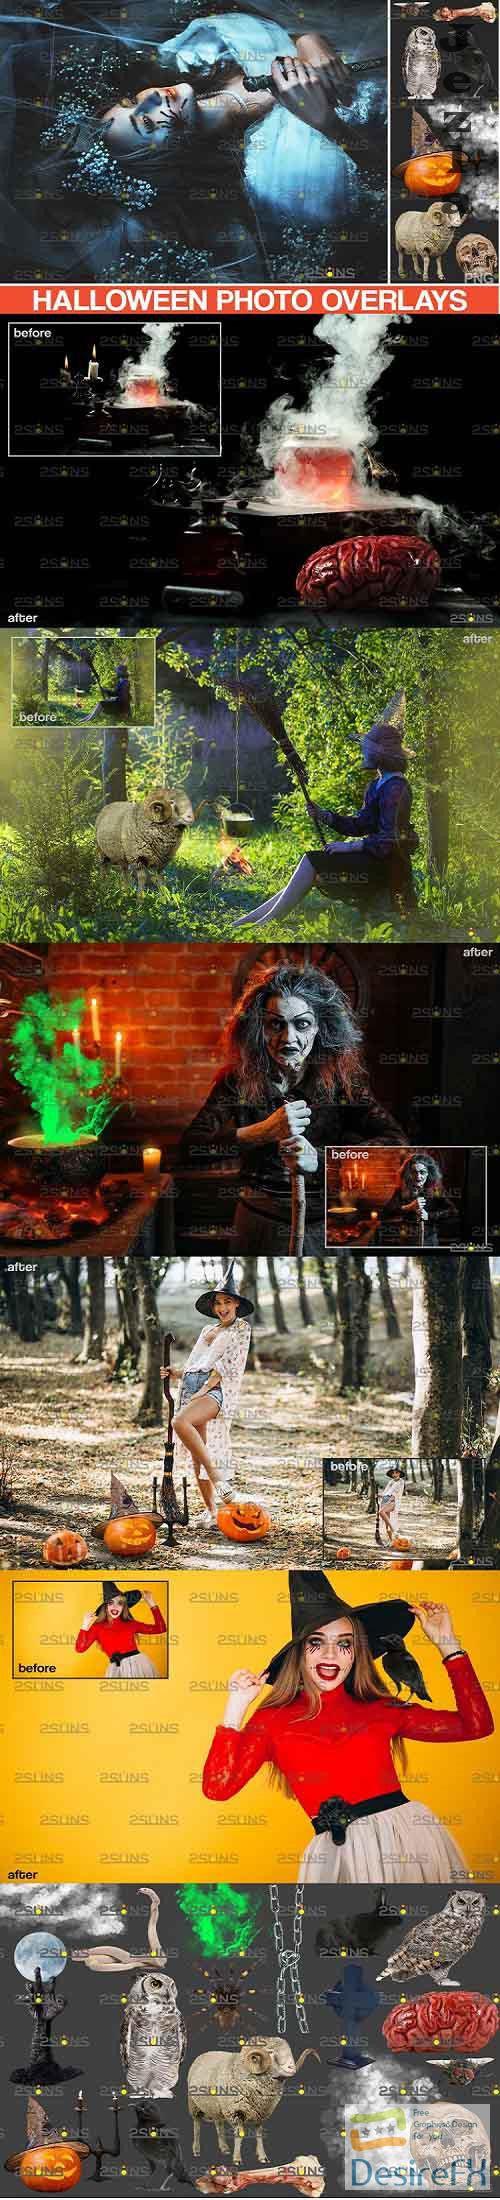 Photoshop overlay & Halloween clipart pumpkin clipart - 895935